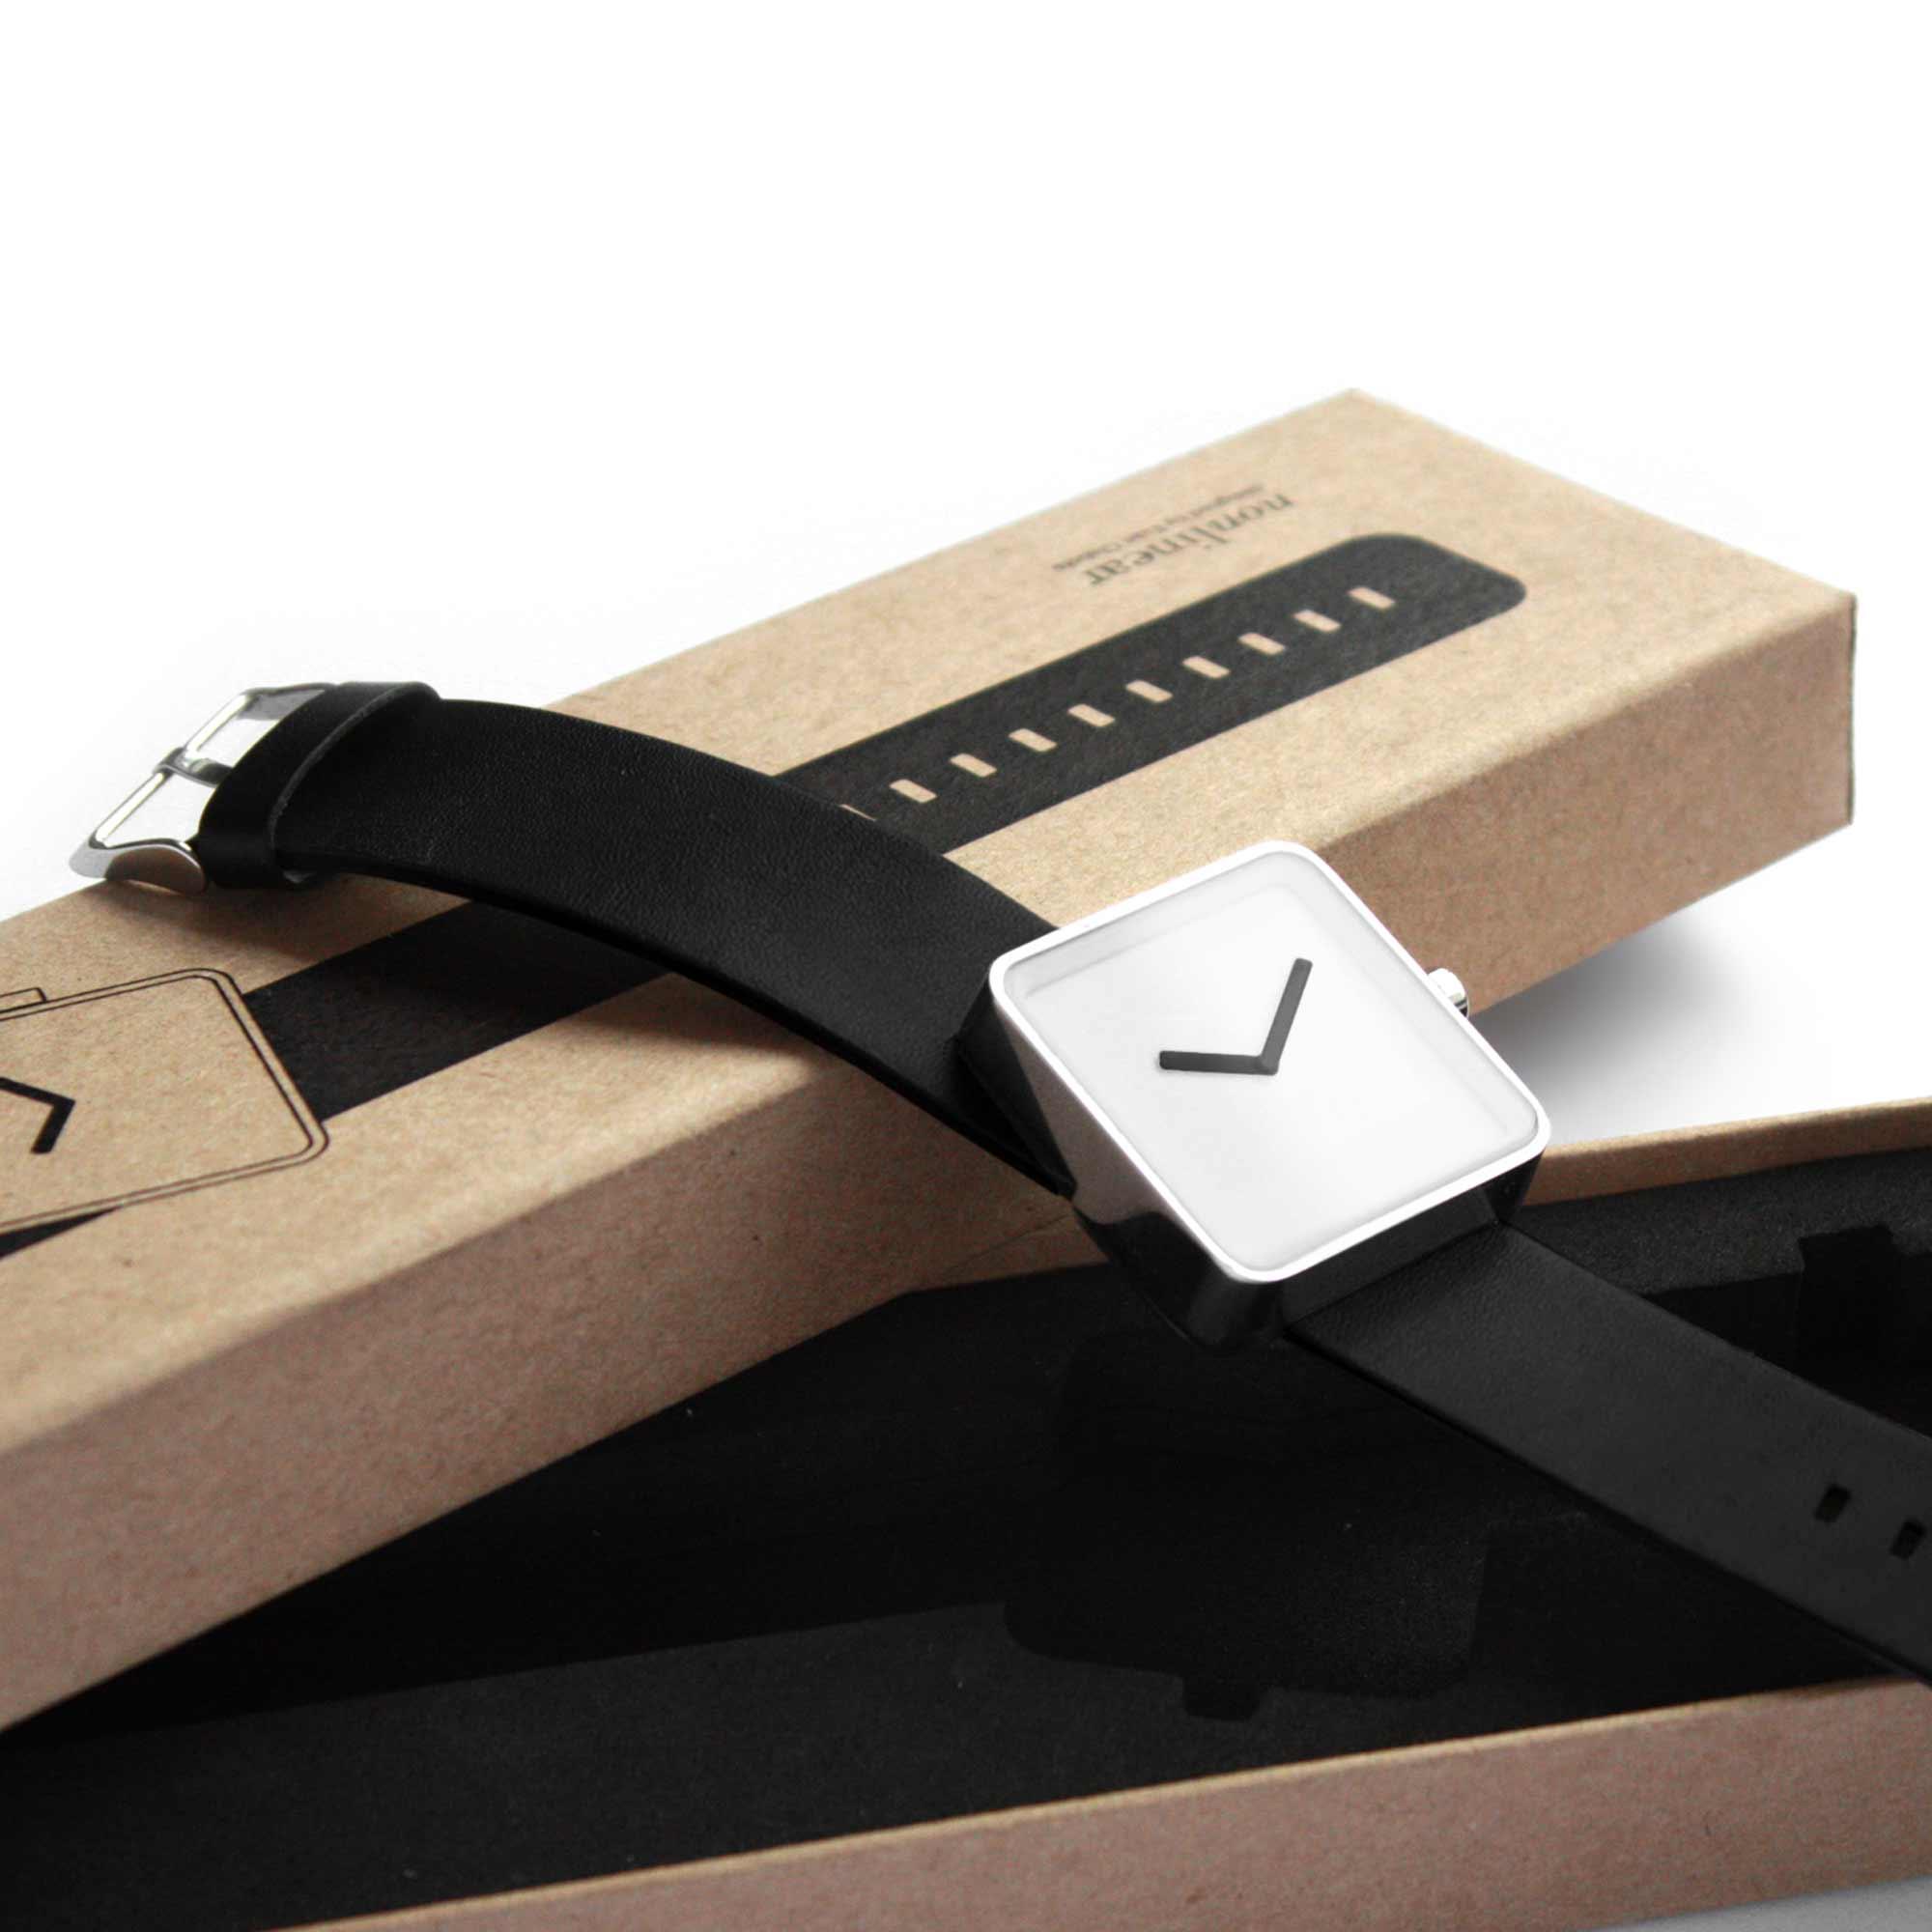 Slip Watch Packaging   Client: Nonlinear 2010